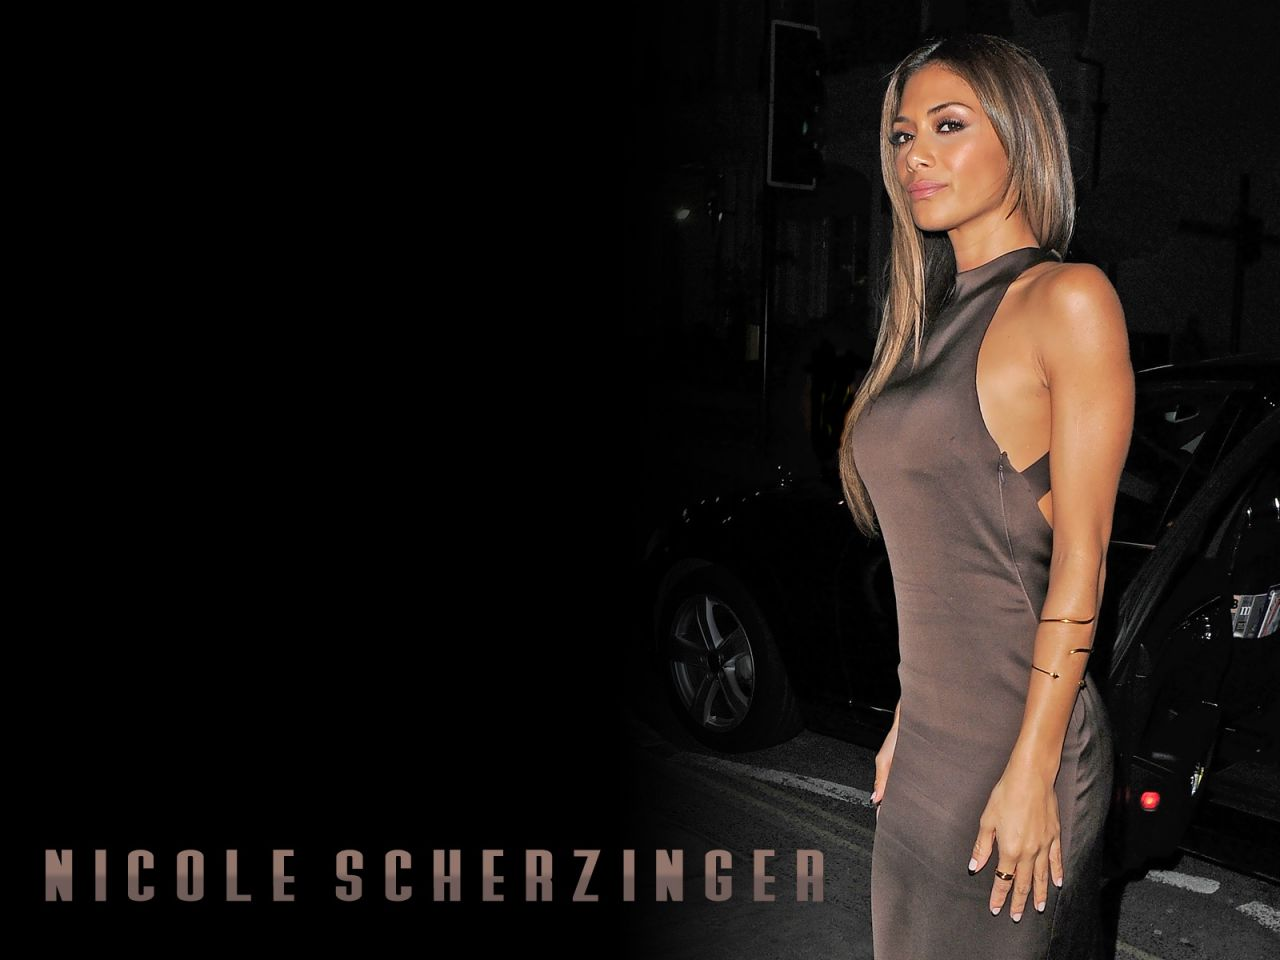 Nicole Scherzinger Wallpaper 2014 Nicole Scherzinger Wallpapers